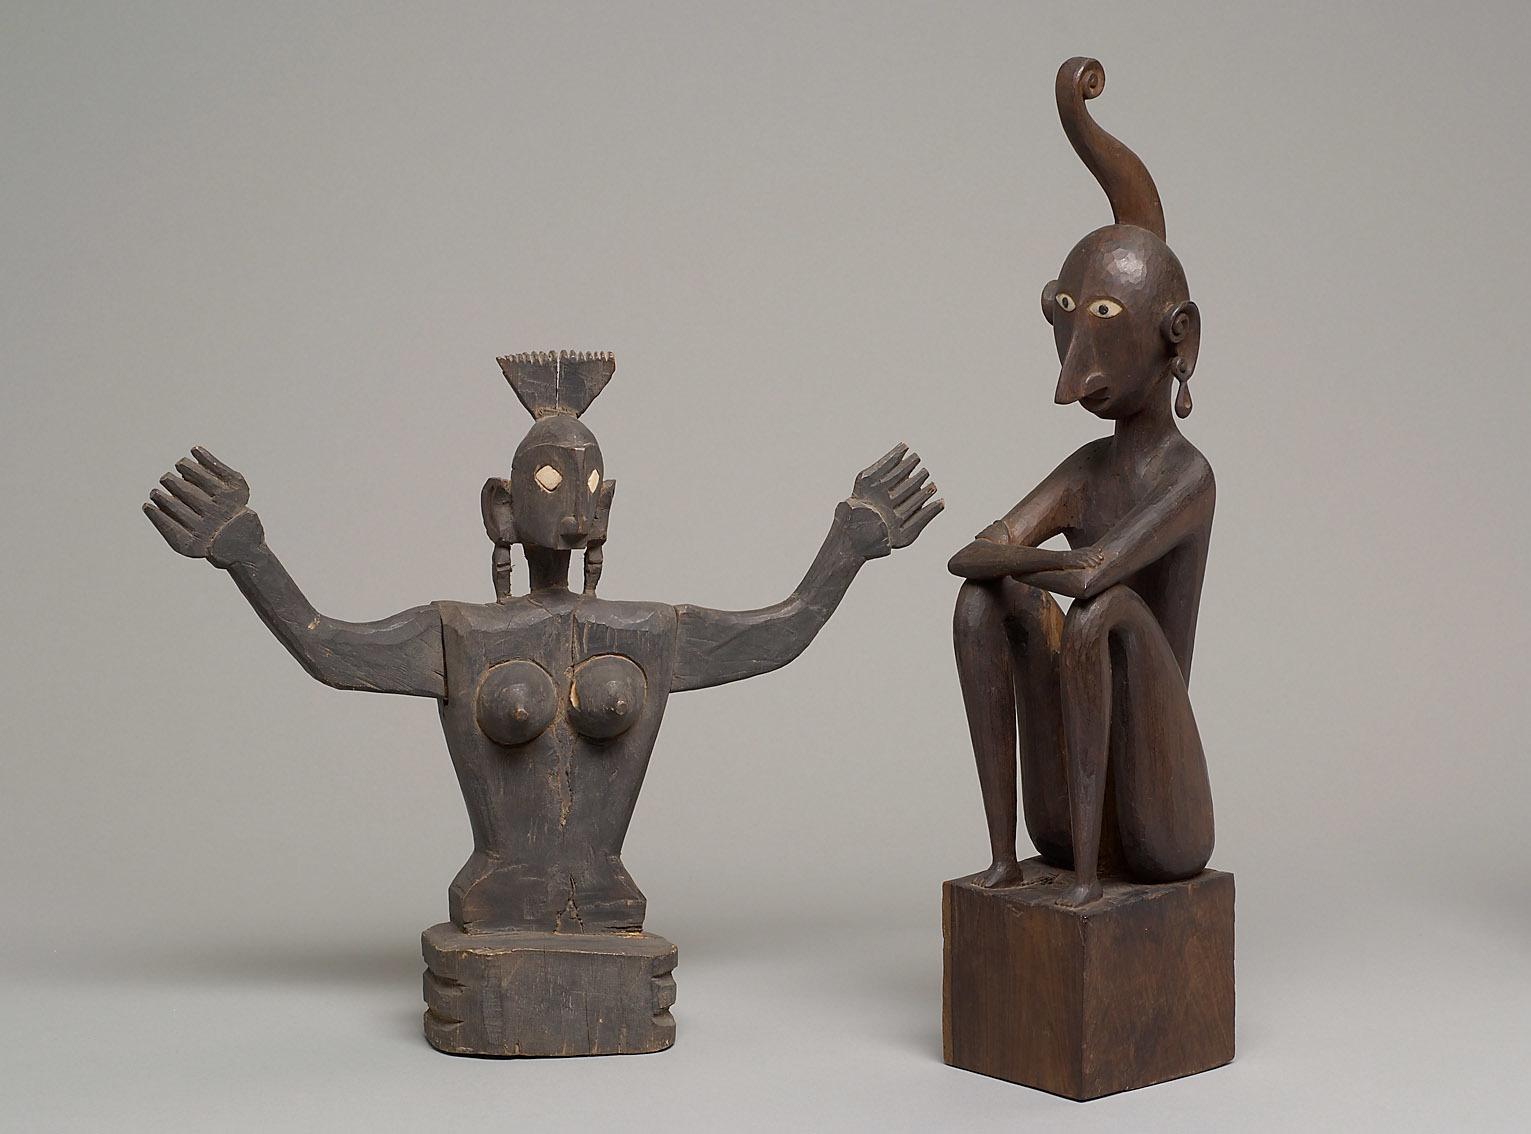 Moluccan Ancestor Figures |  Lairliante & Luli  | 1892 © KHM-Museumsverband